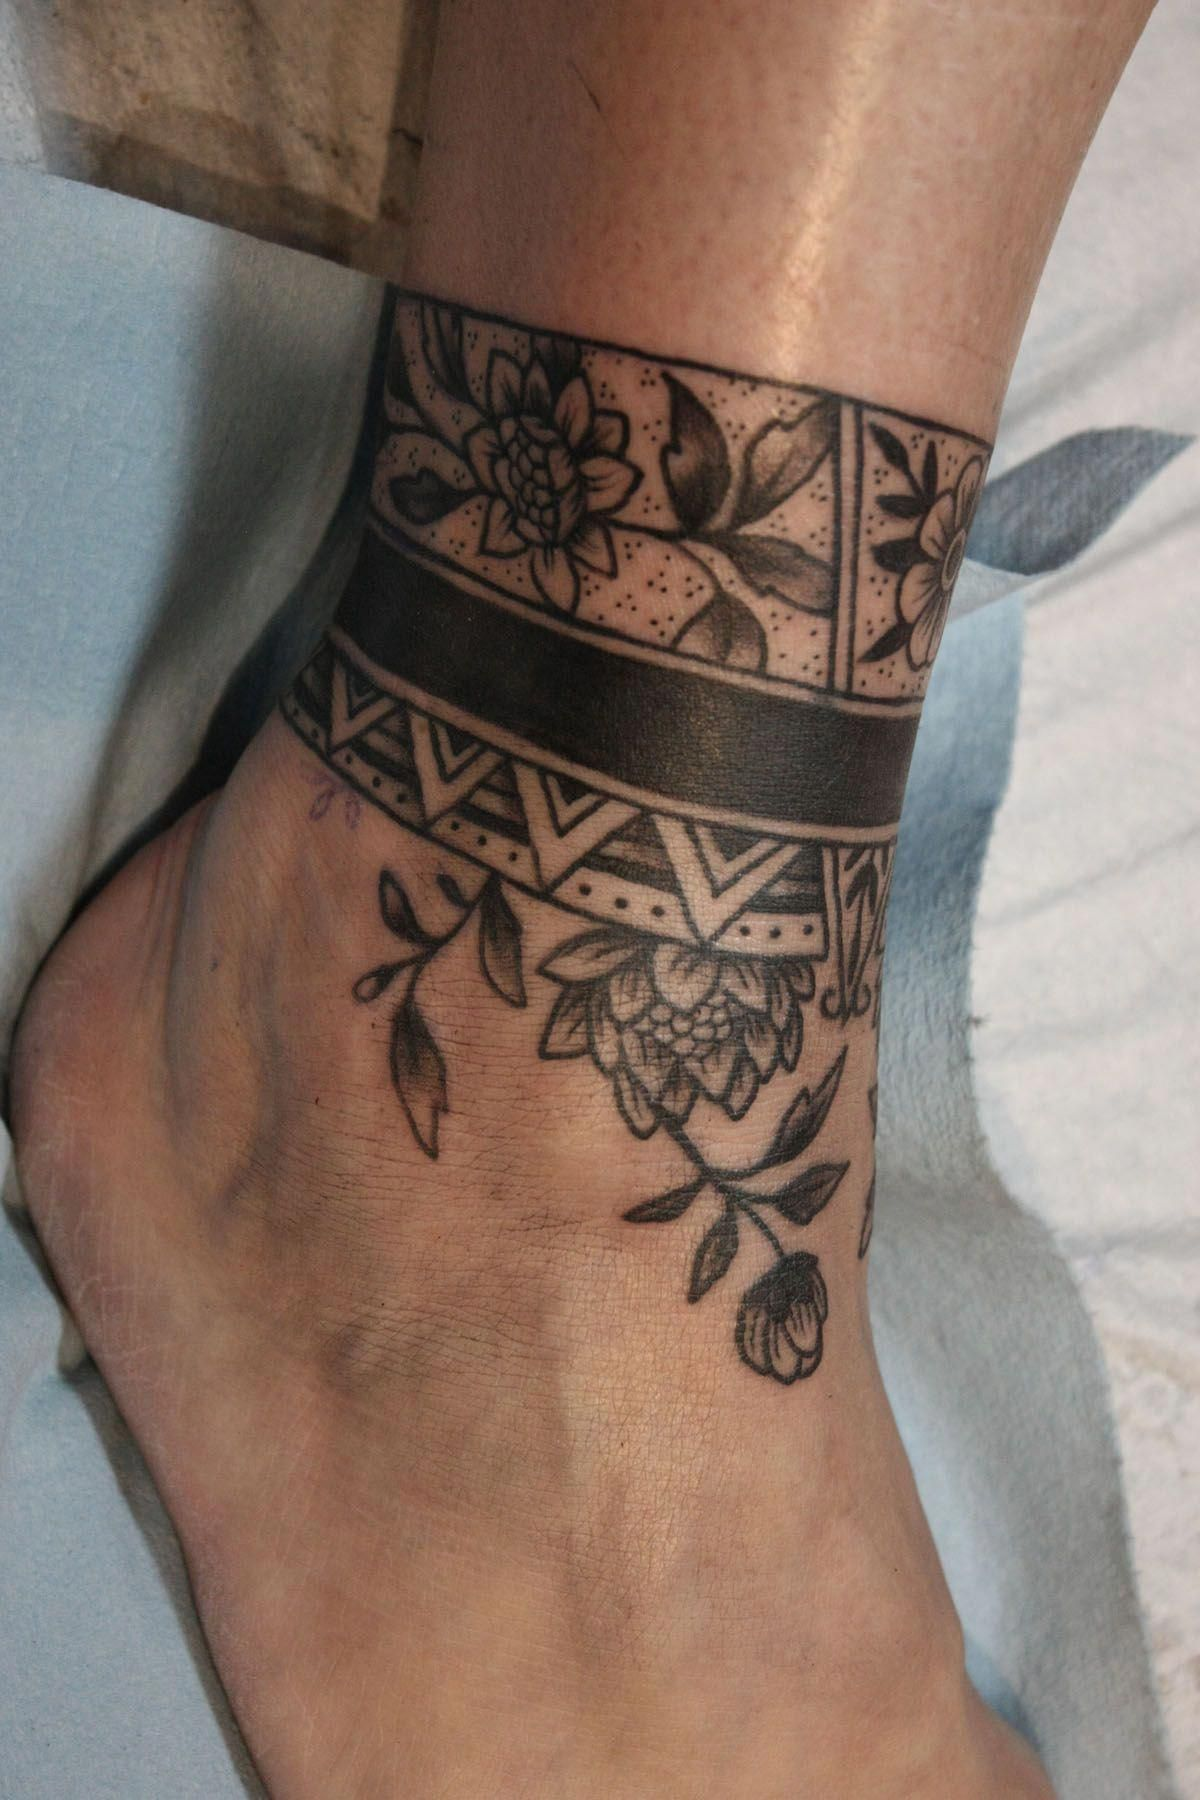 tattoo on foot Foottattoos Wrap around ankle tattoos